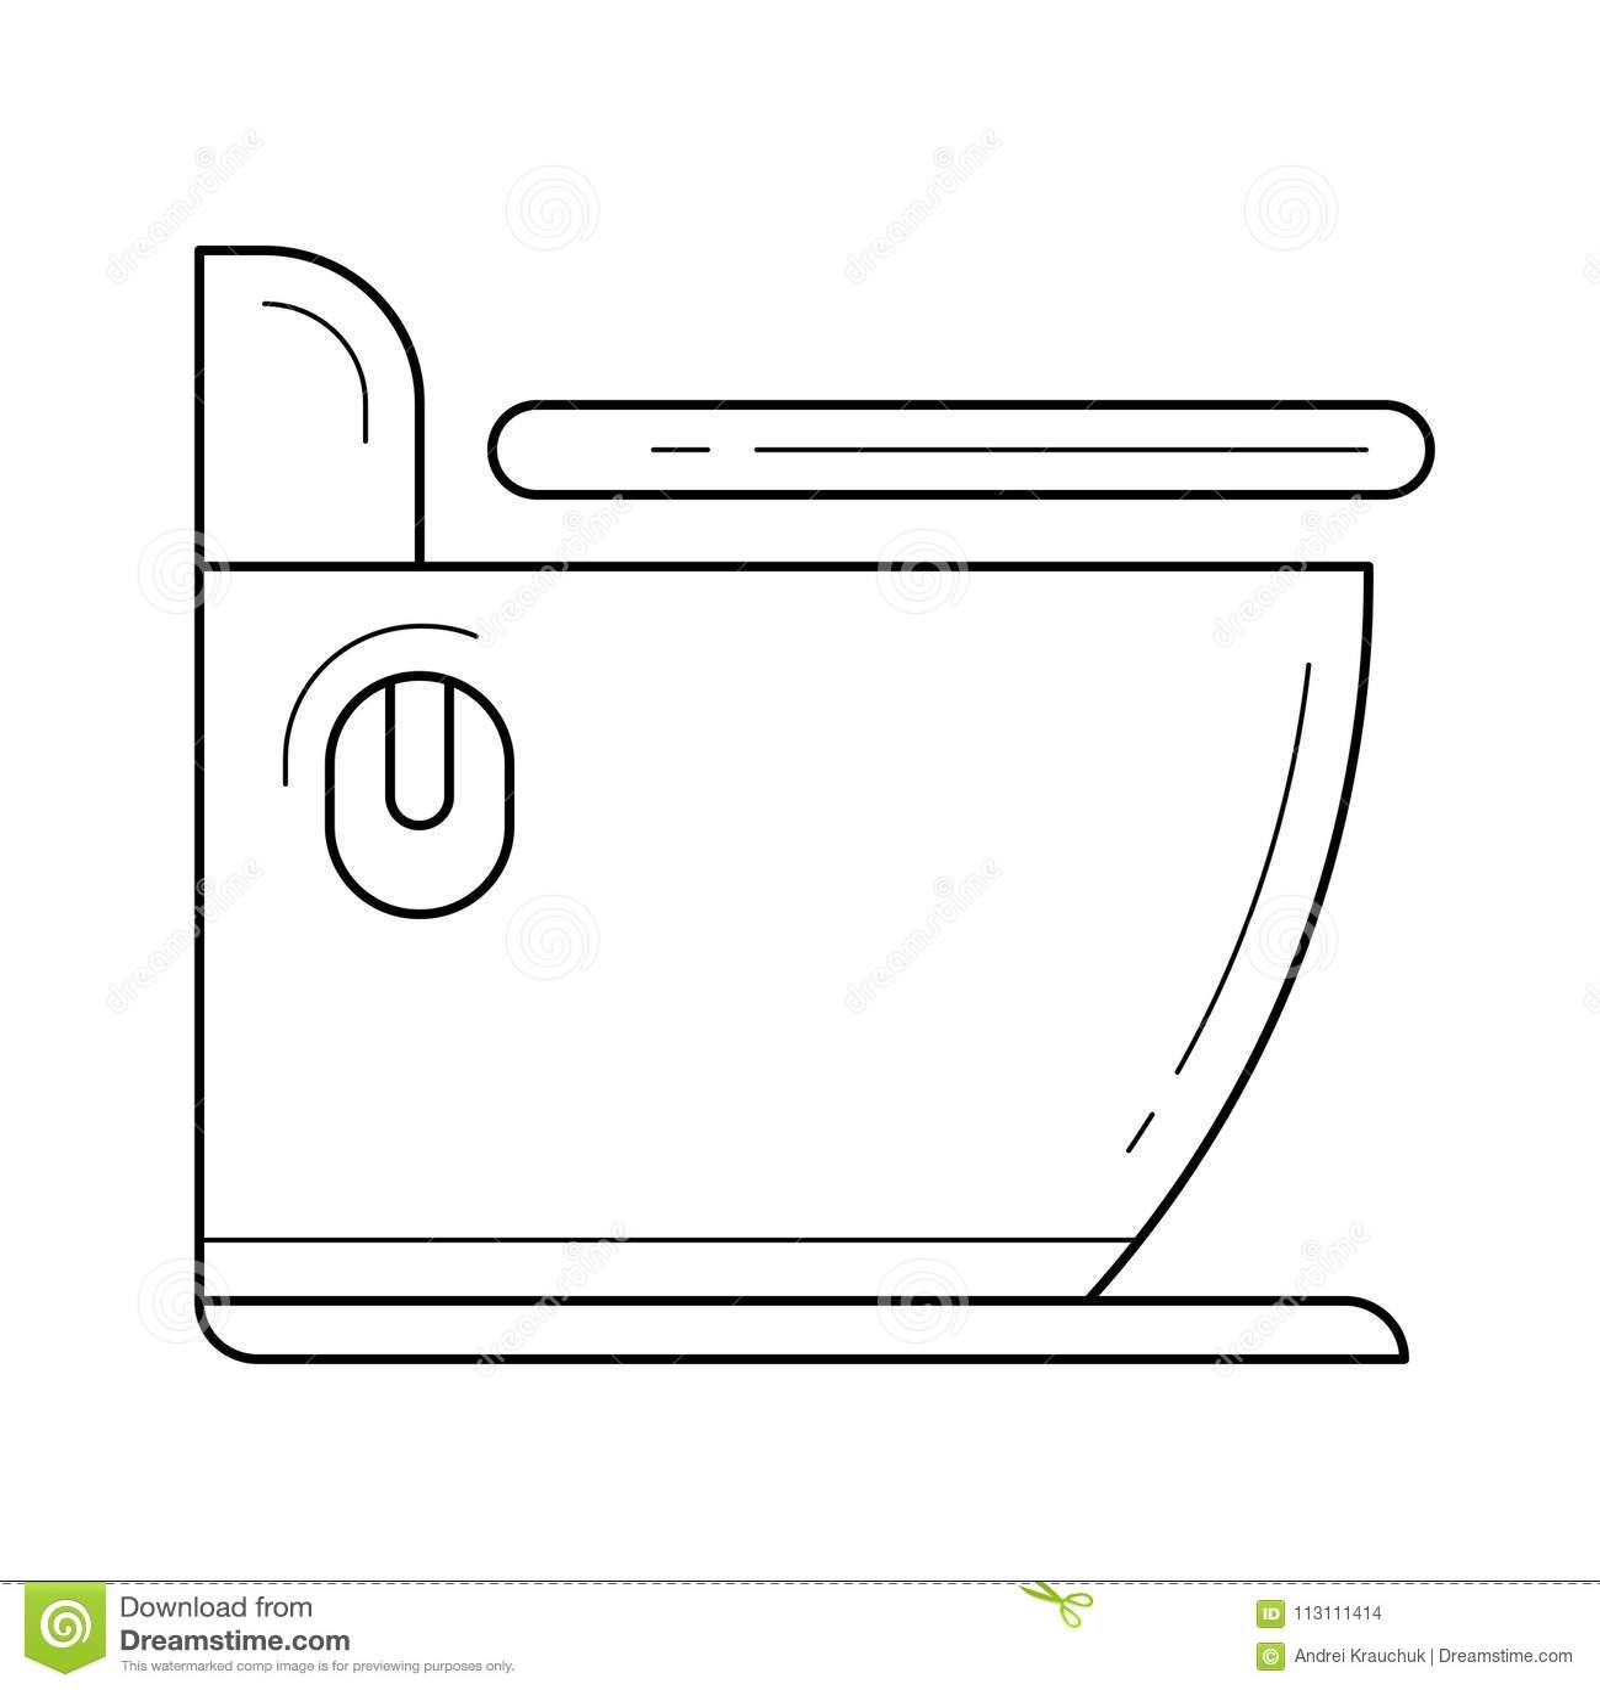 Toilet line icon. stock vector. Illustration of minimal - 113111414